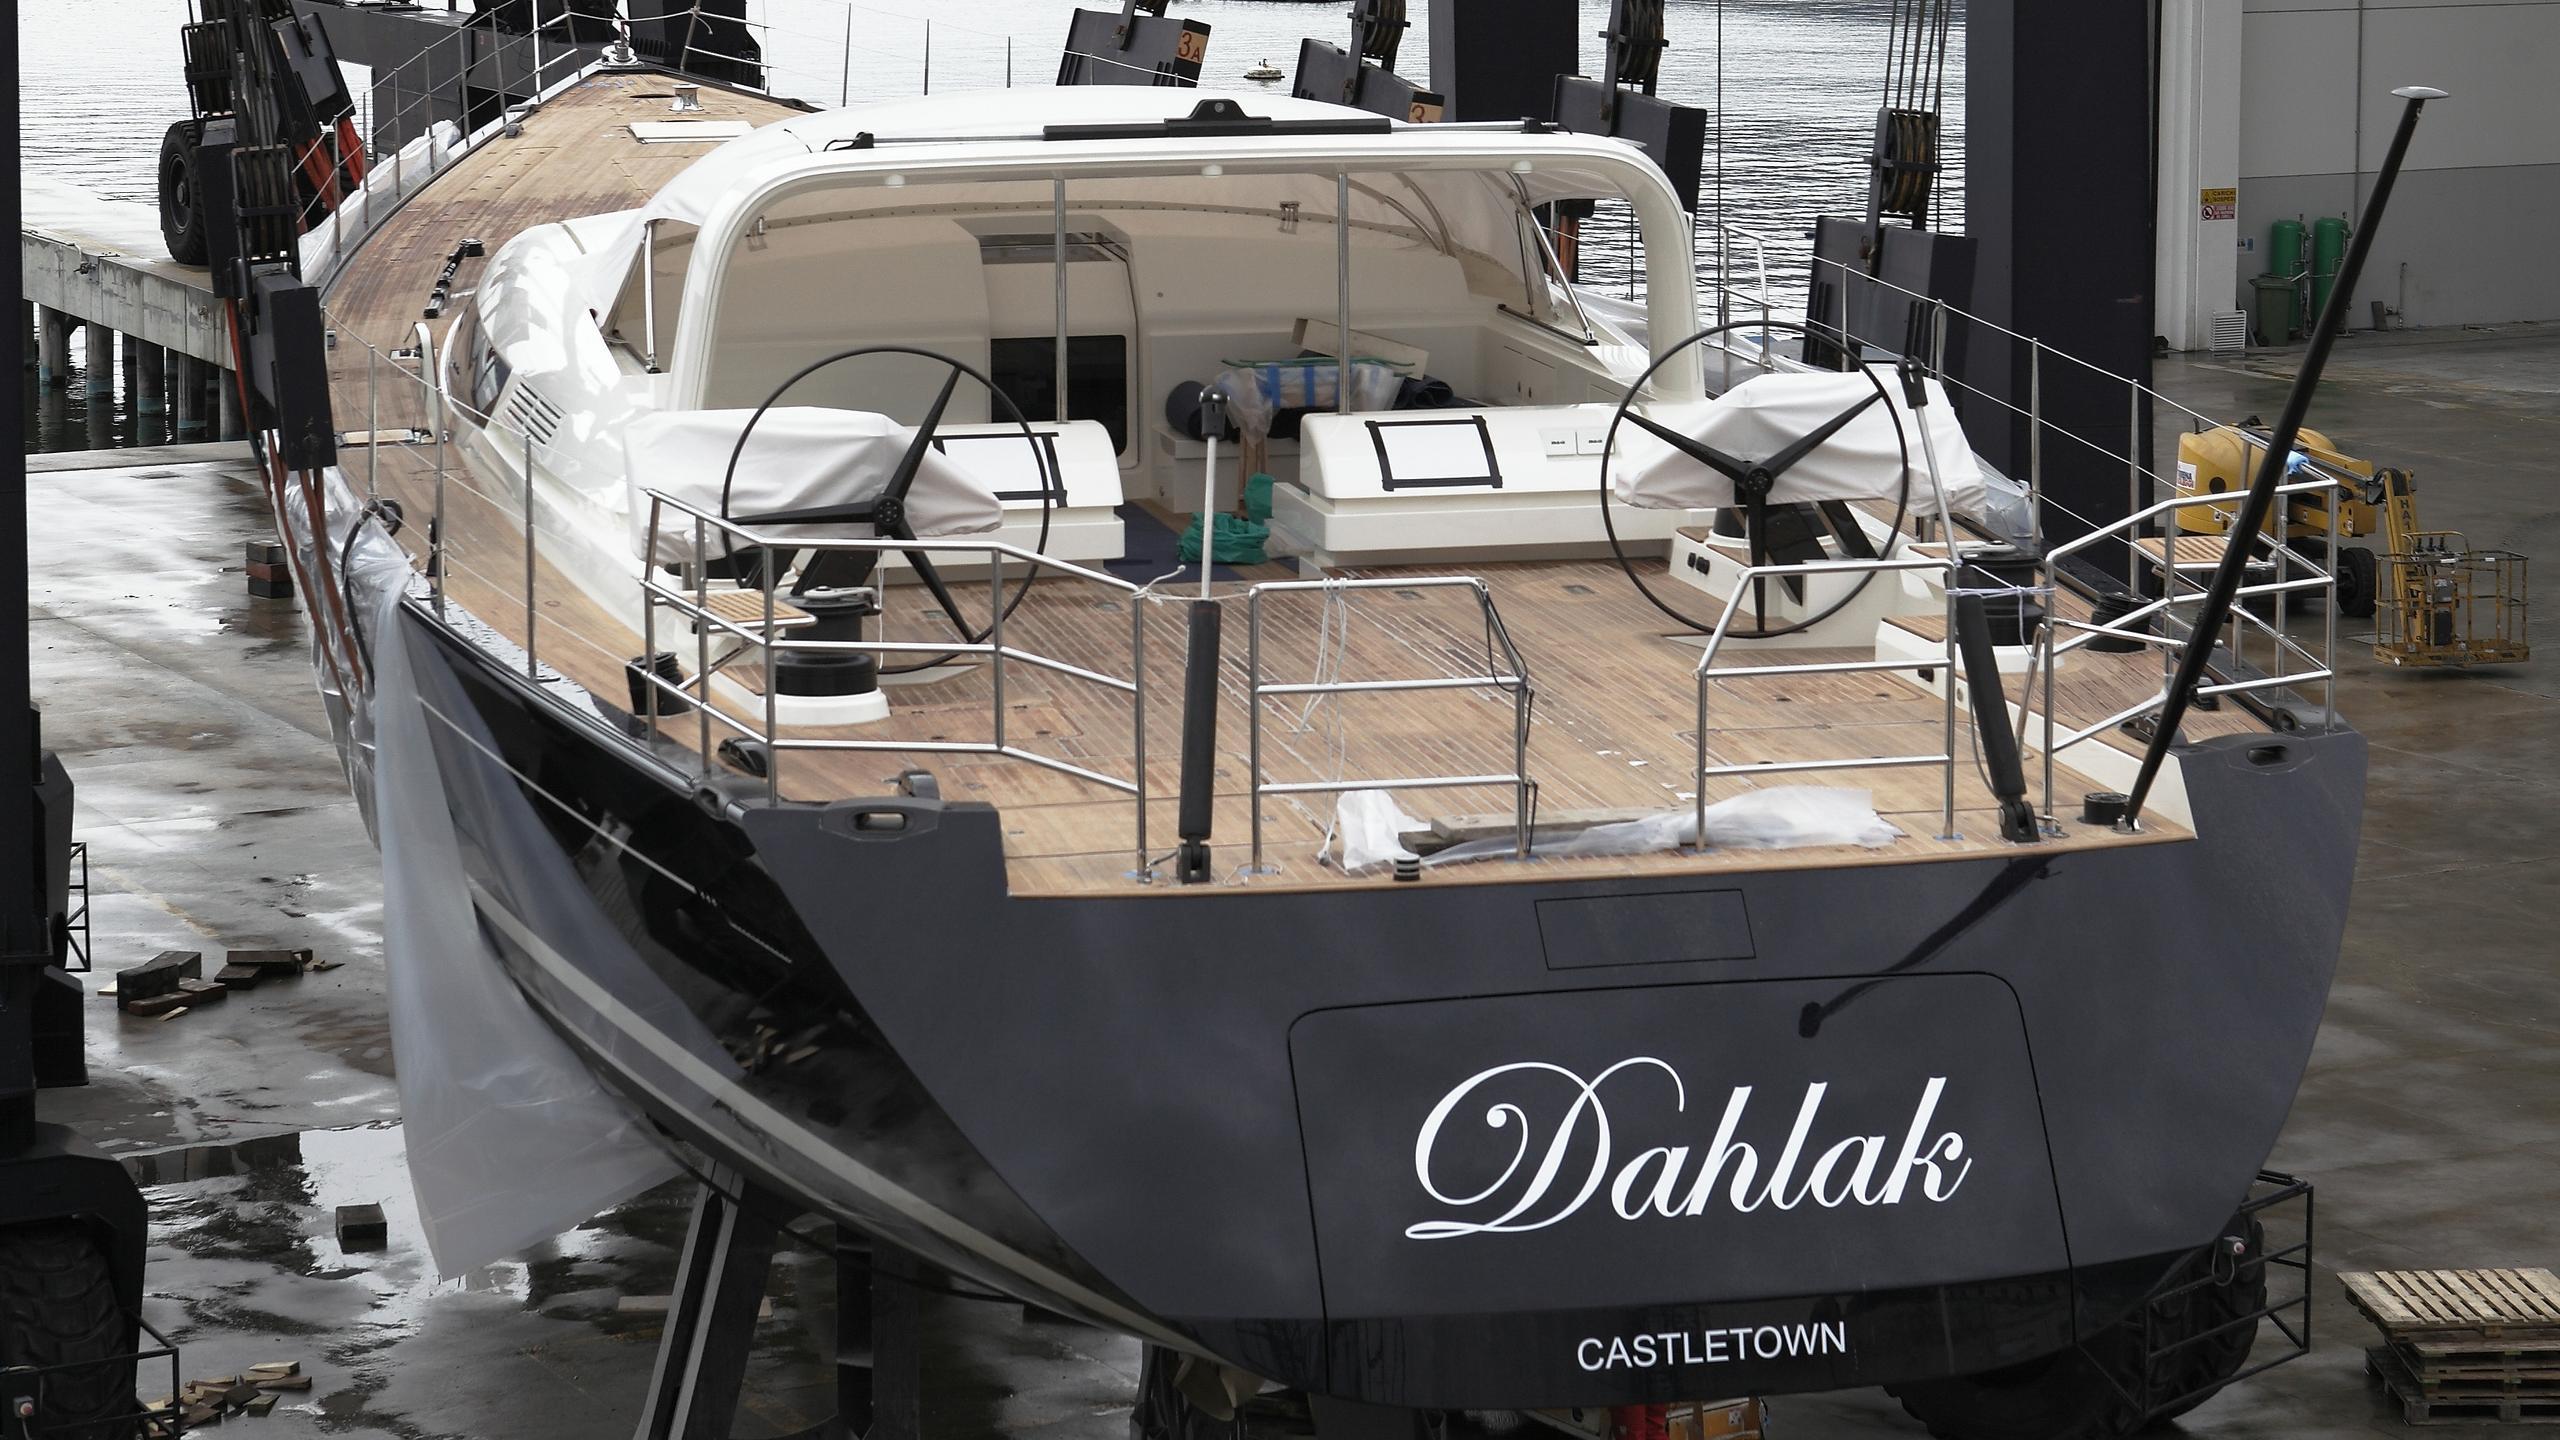 dahlak-sailing-yacht-perini-navi-2016-38m-stern-view